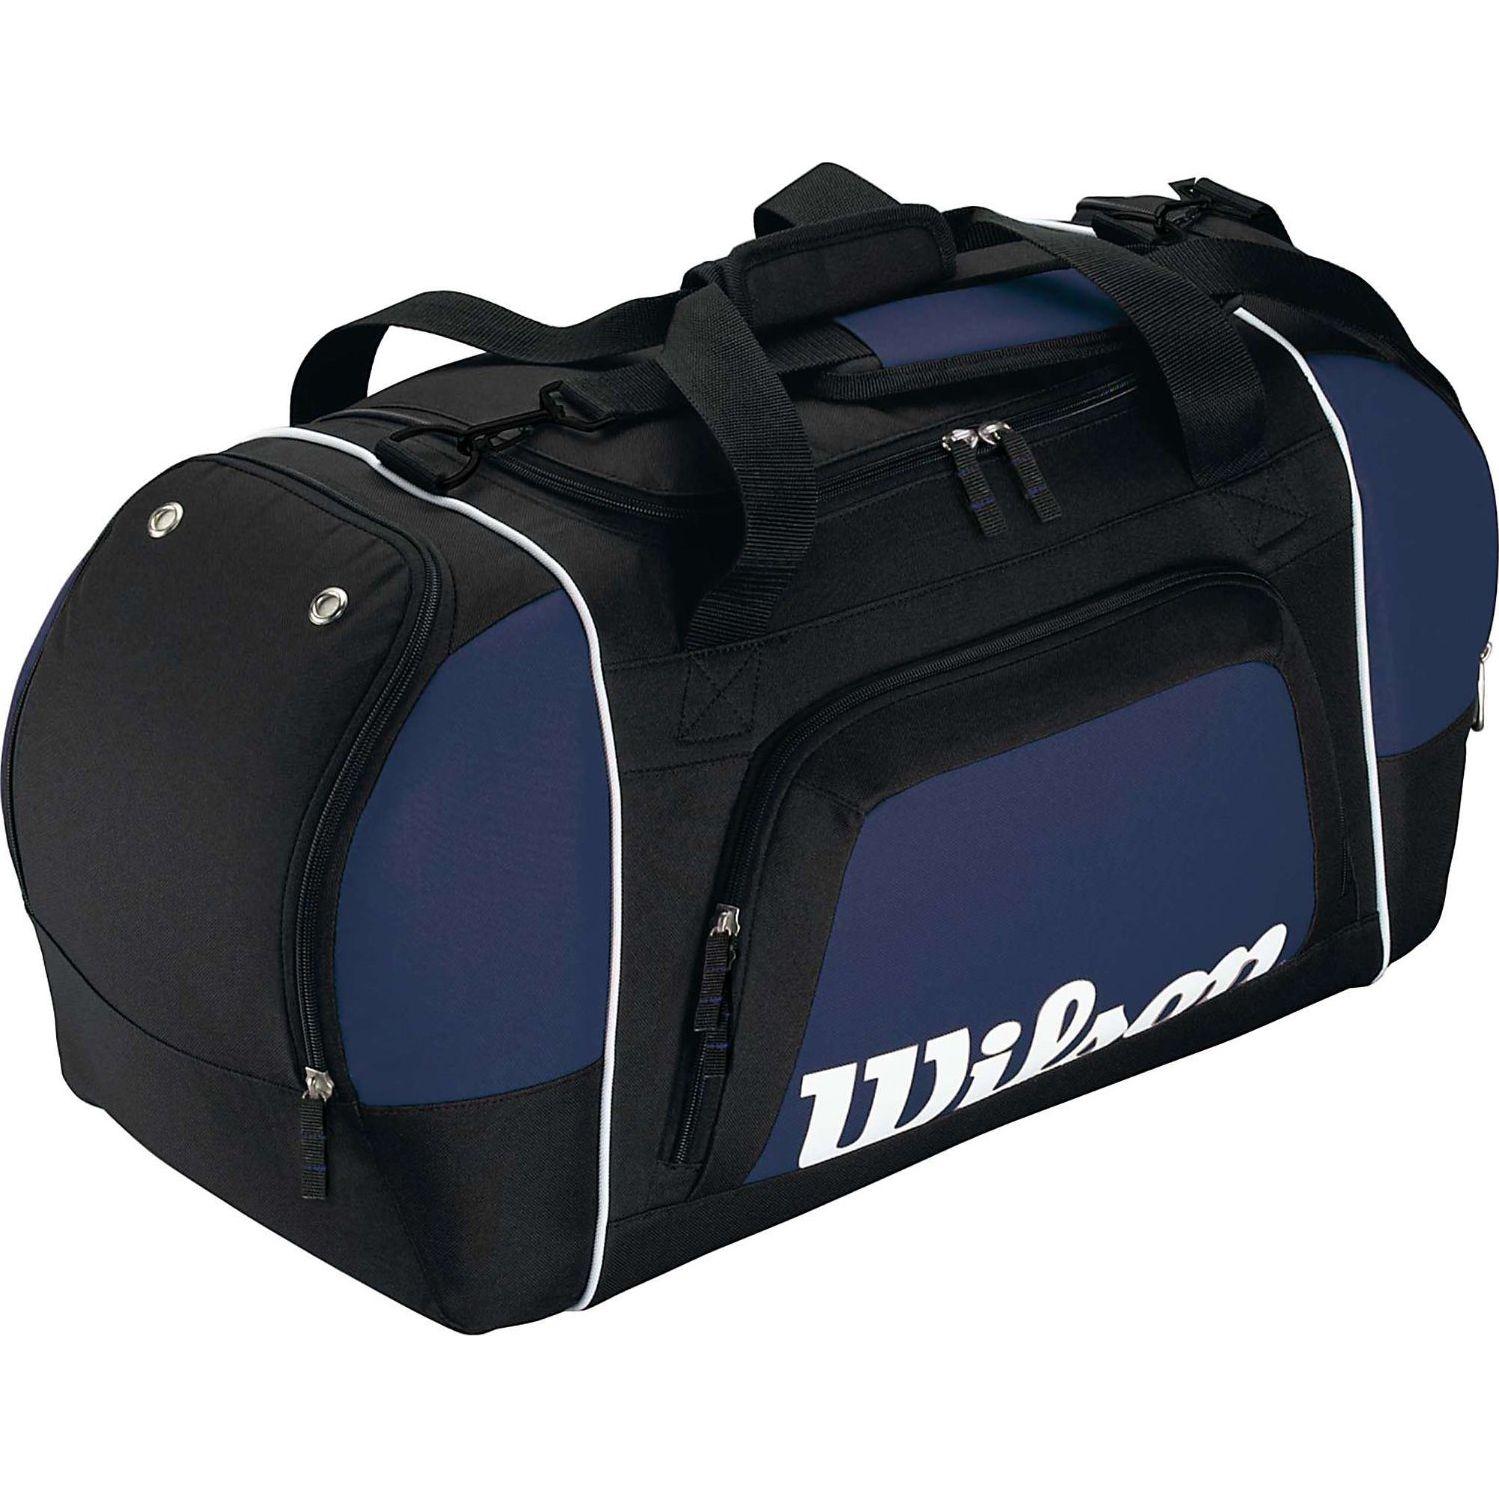 Individual Player's Duffle Bag Navy Gear bag, Bags